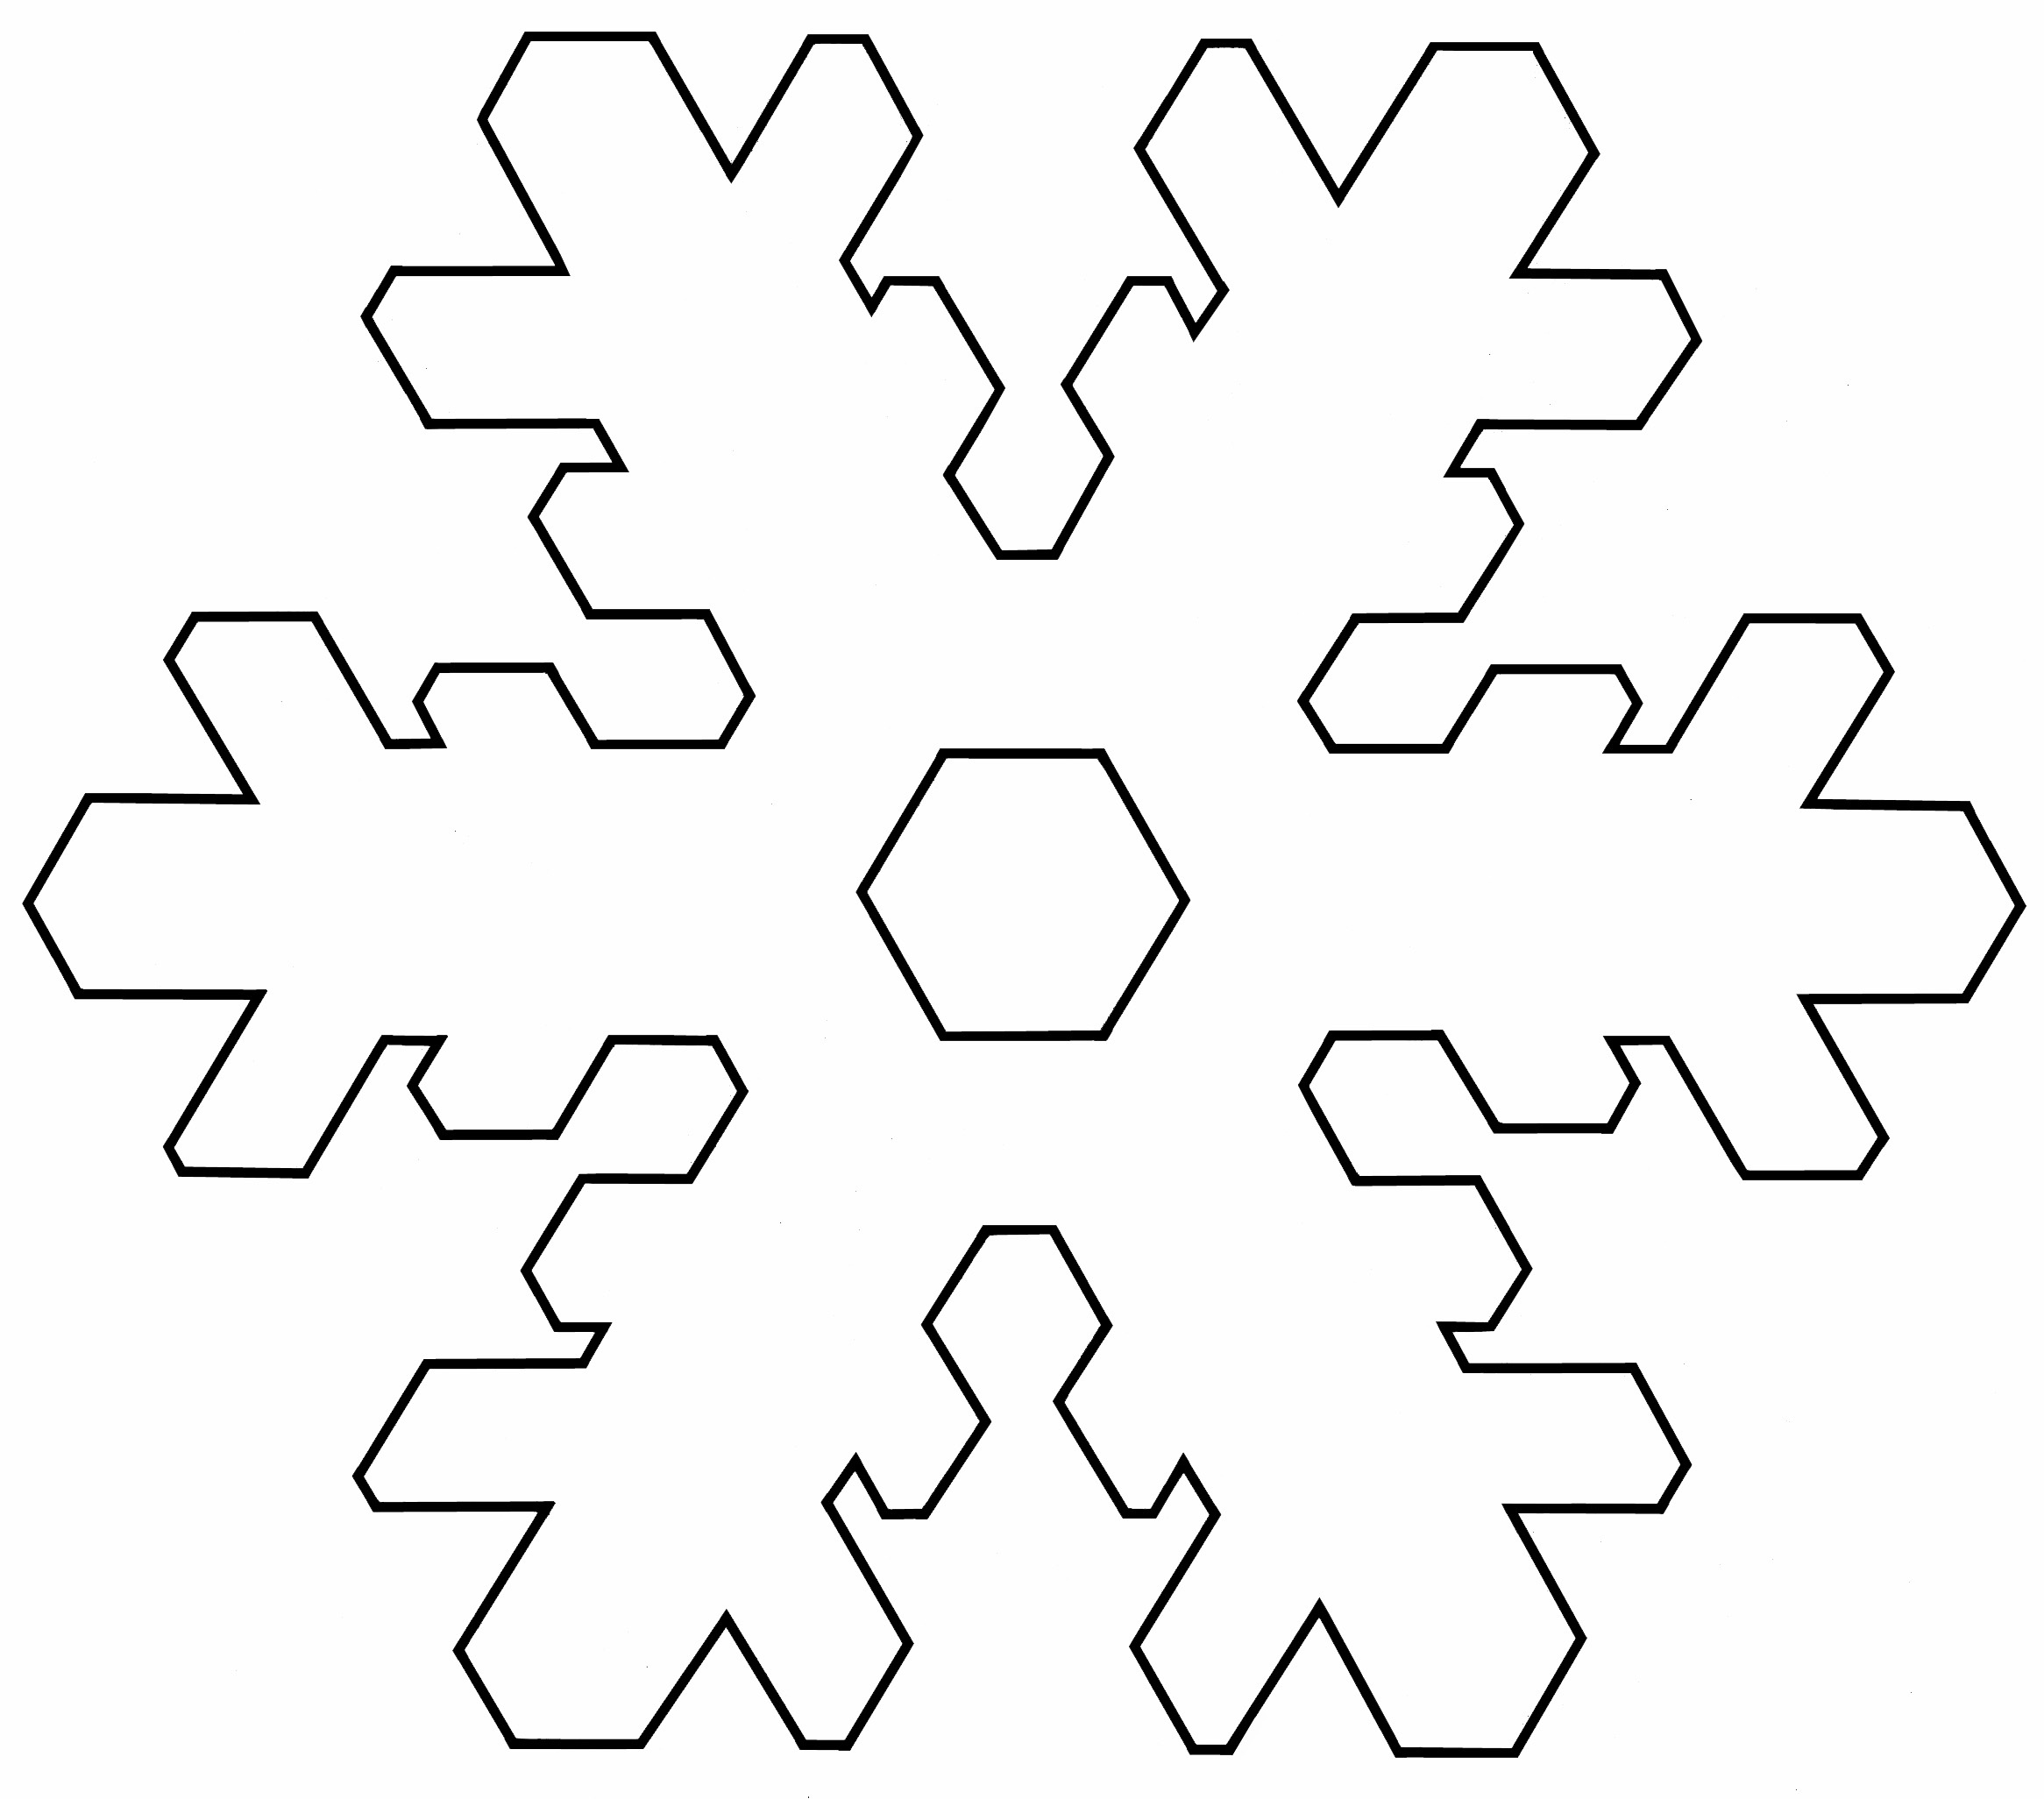 Free Printable Snowflake Templates. Paper Snowflake Pattern - Free Printable Snowflakes